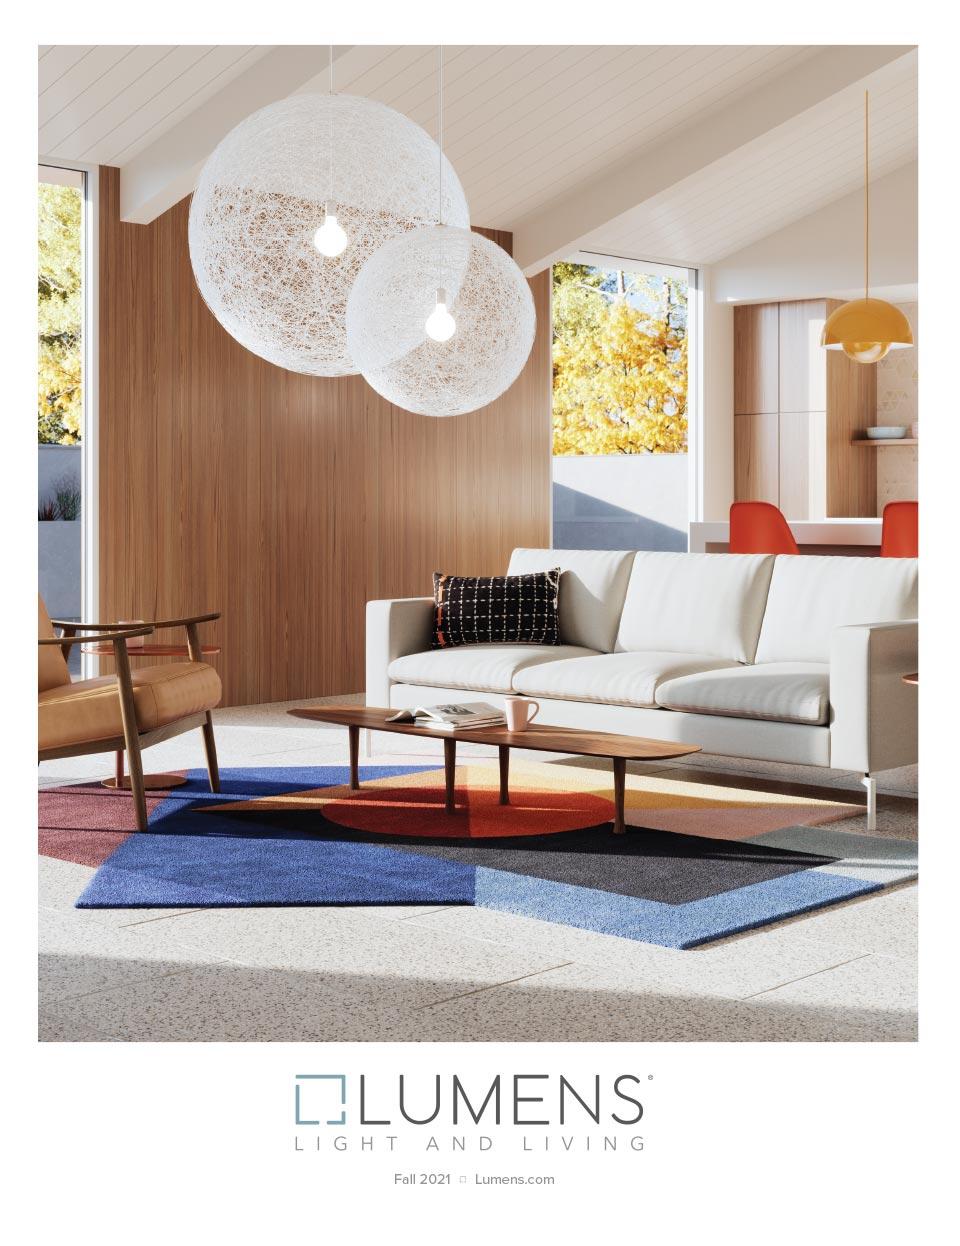 View the Lumens Fall Summer eCatalog